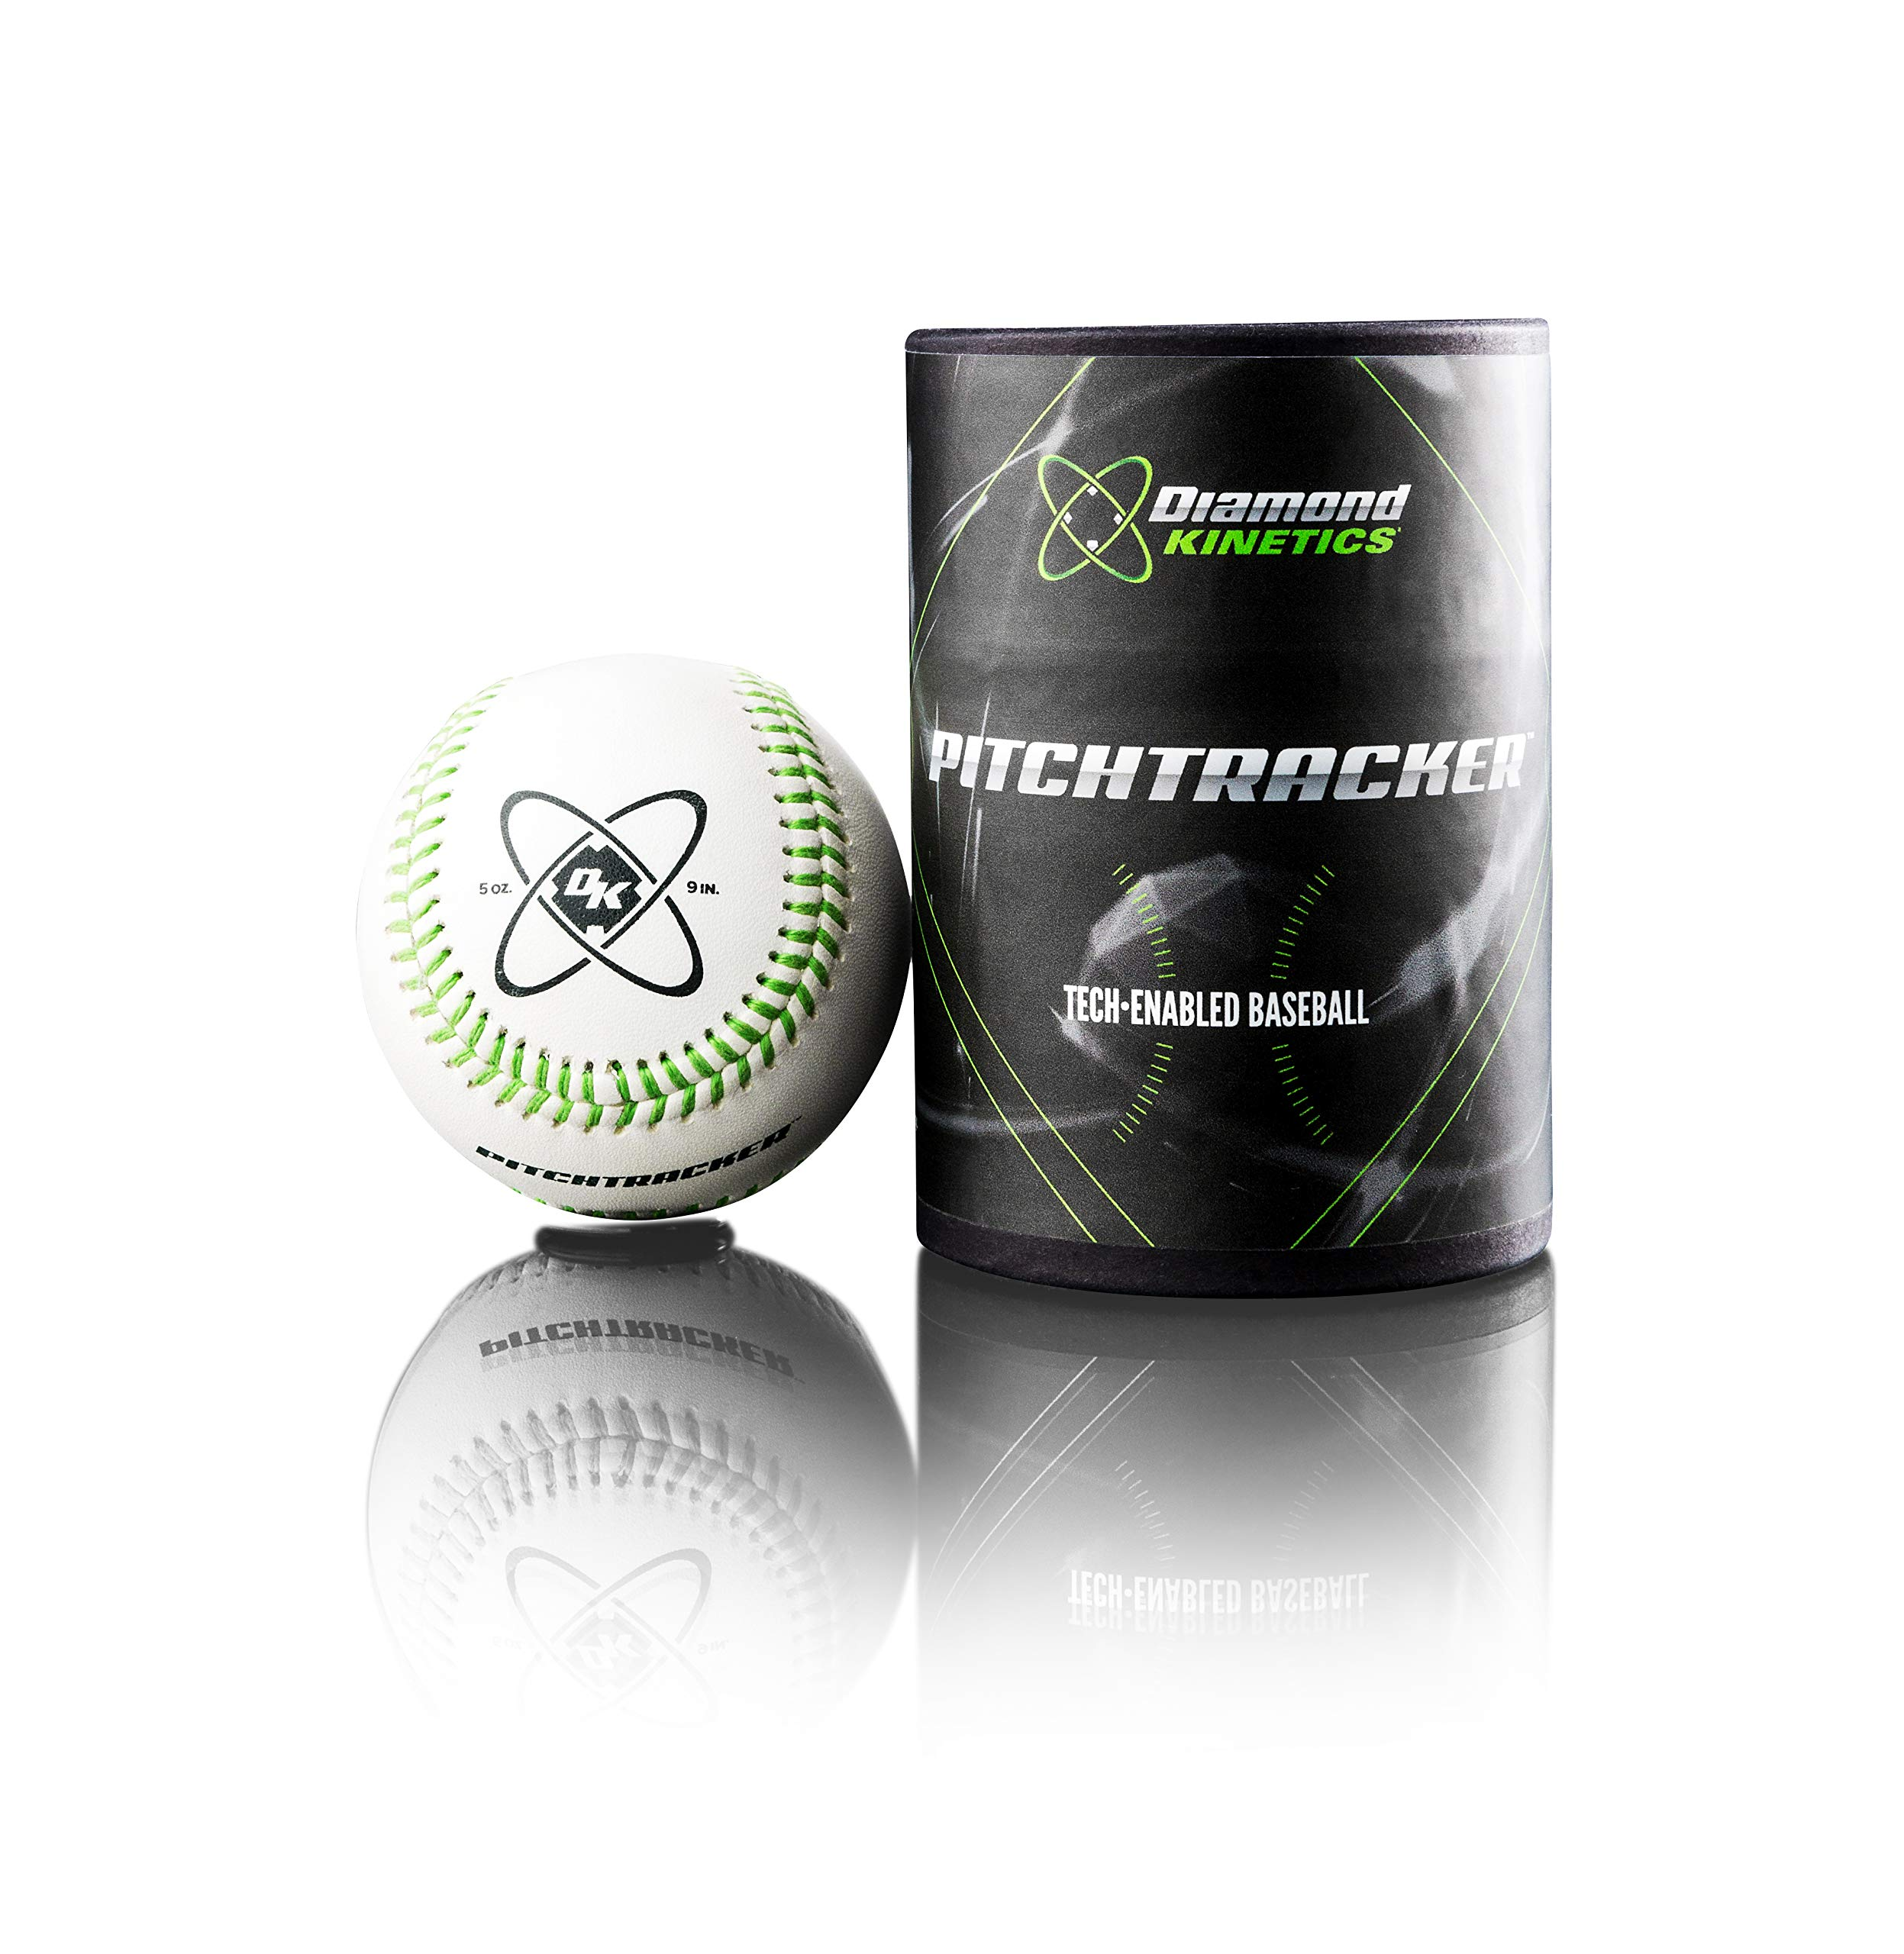 Diamond Kinetics PitchTracker by Diamond